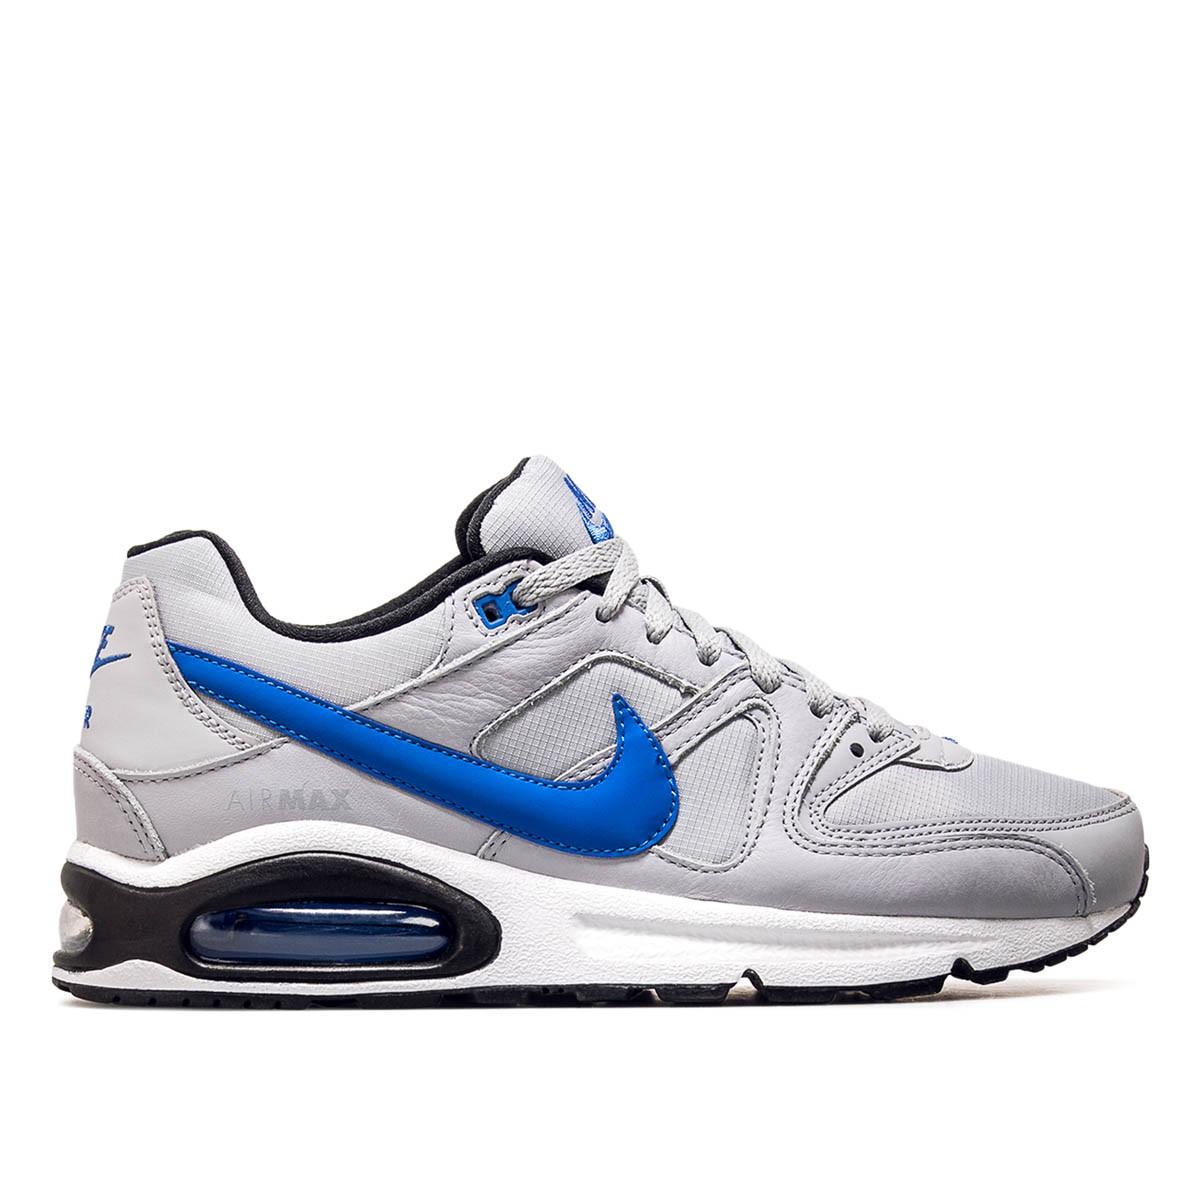 Nike Air Max Command LT Grau